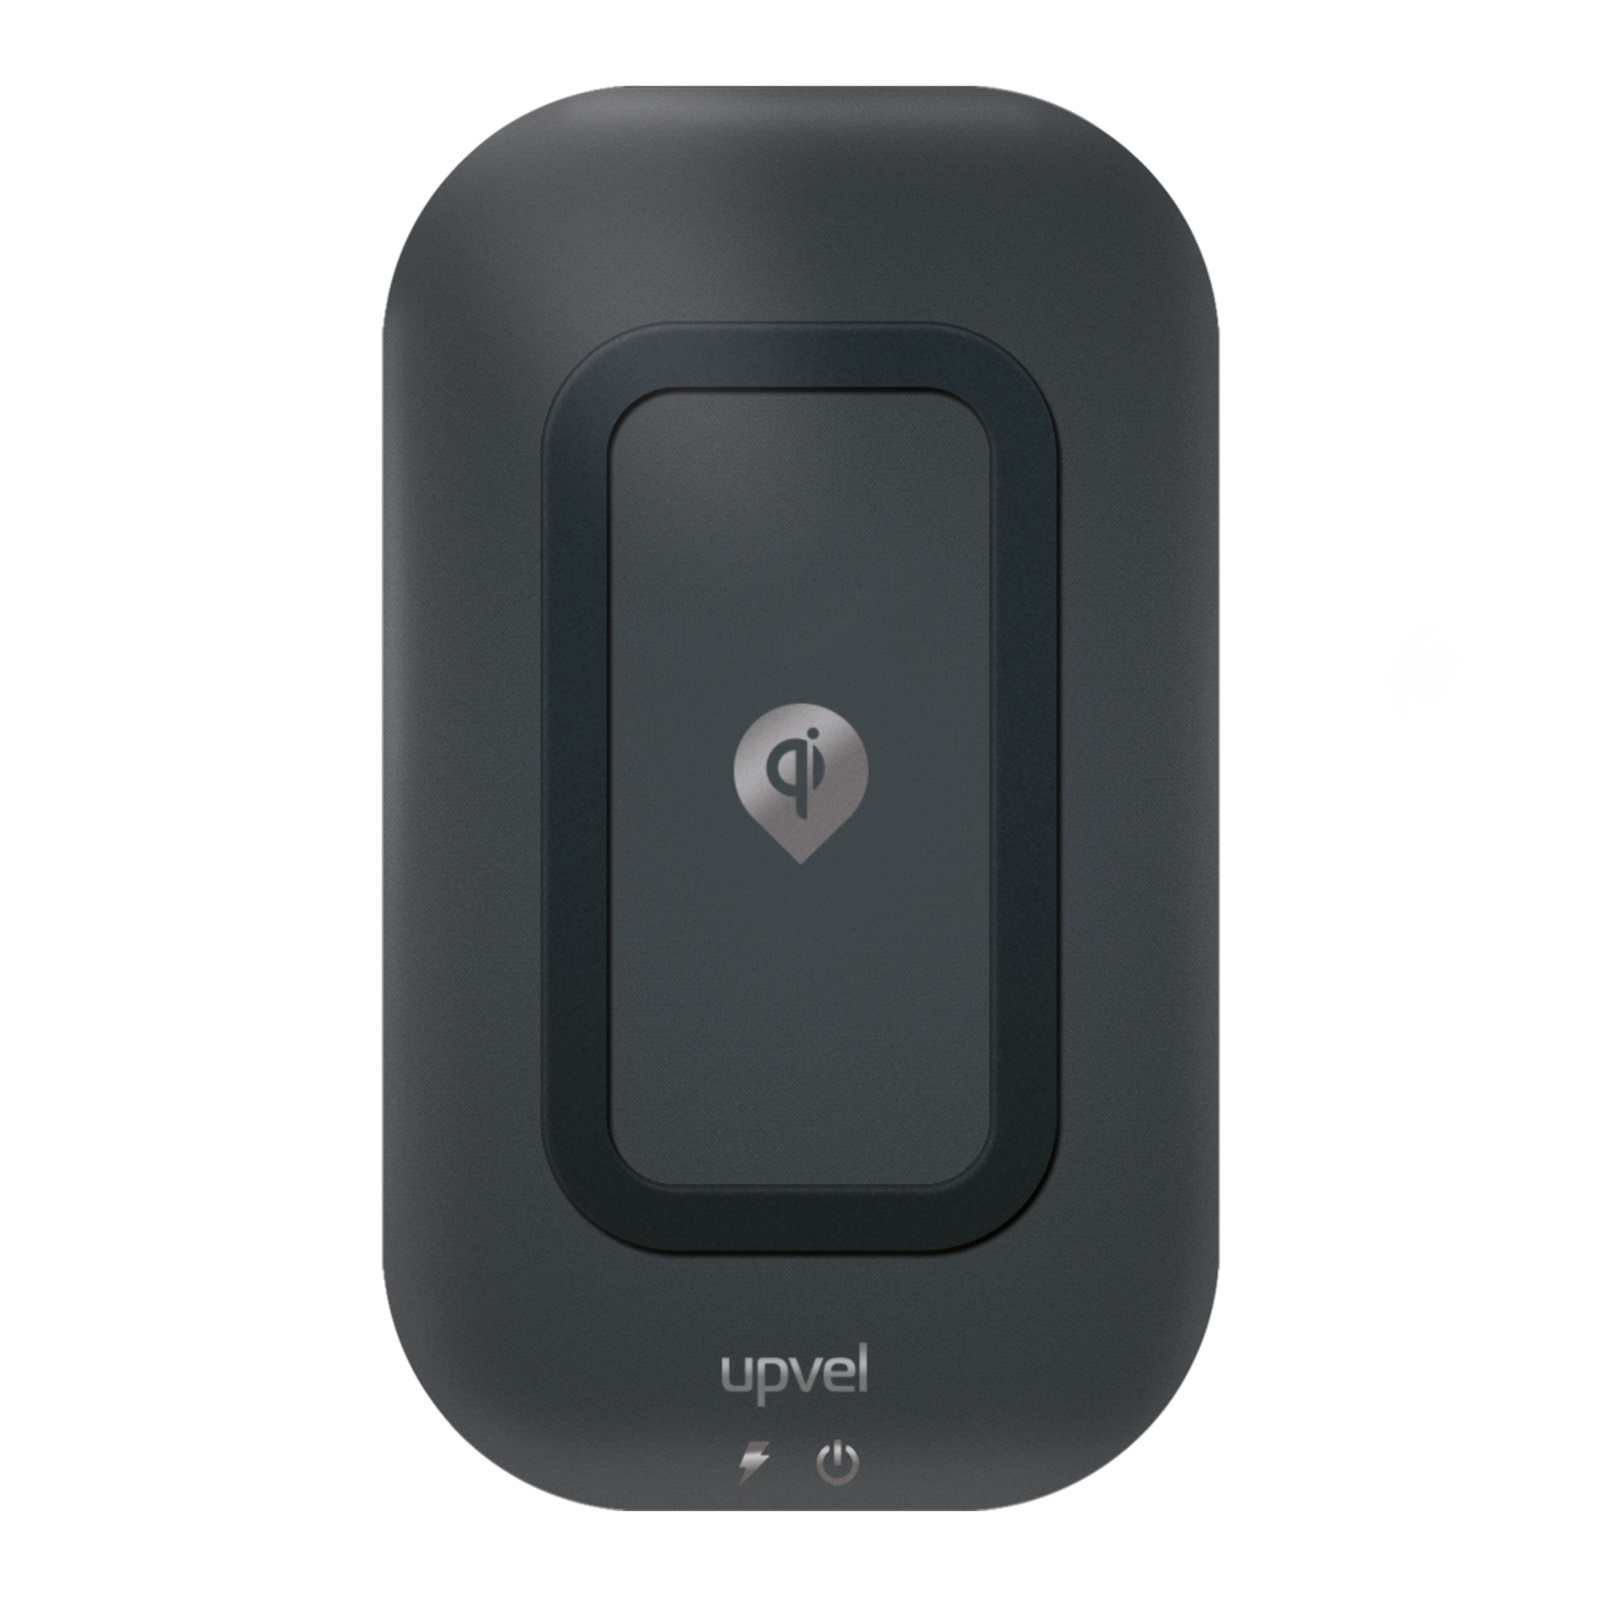 UPVEL UQ-TT01 Stingray, Black беспроводное зарядное устройство стандарта Qi